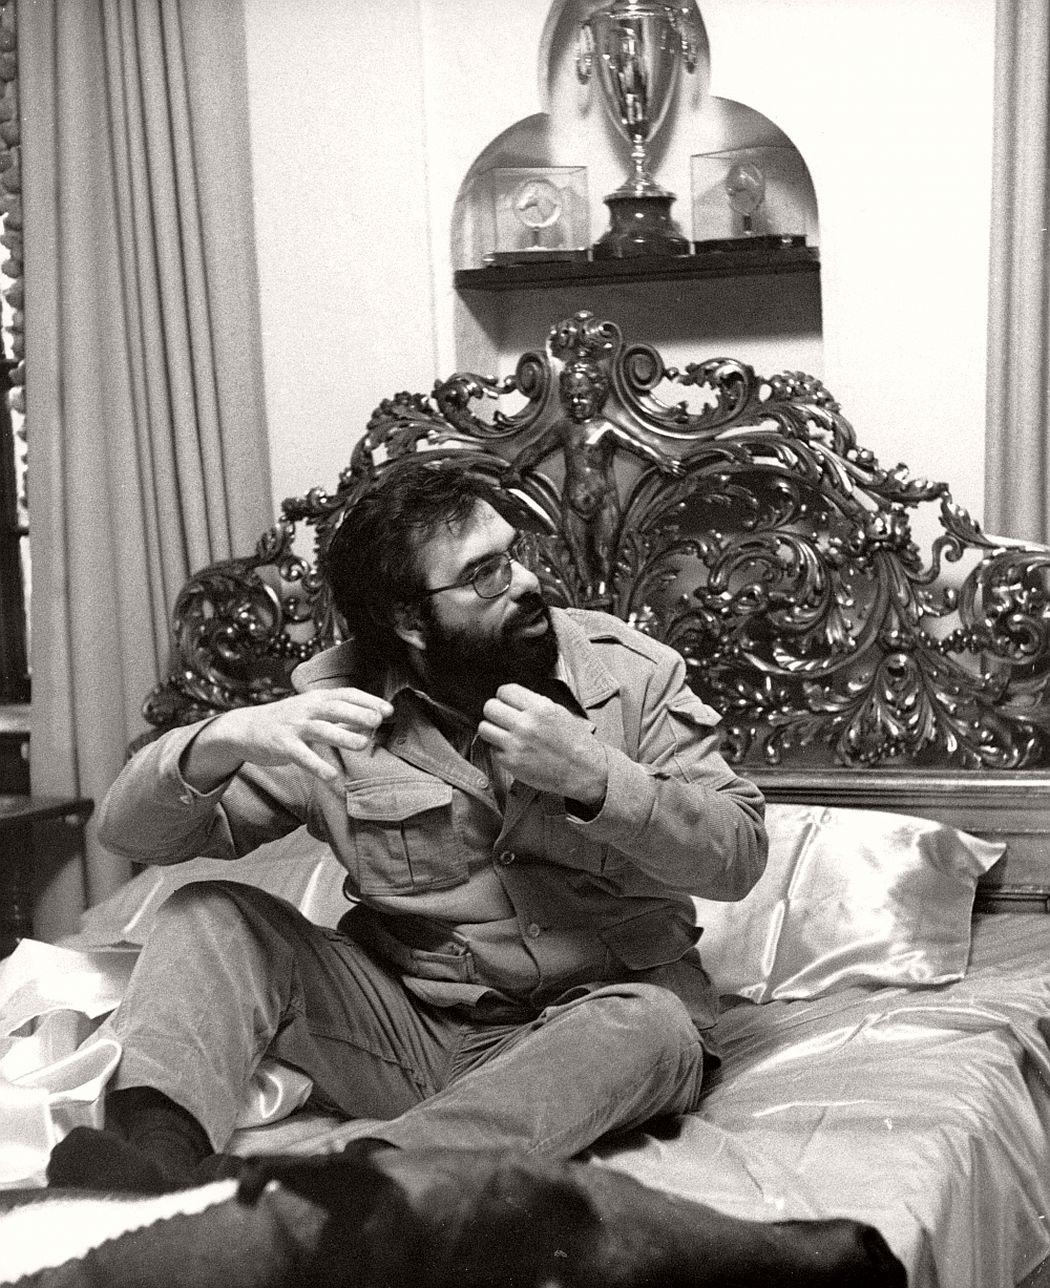 the-godfather-1972-behind-the-scenes-francis-ford-coppola-marlon-brando-al-pacino-58